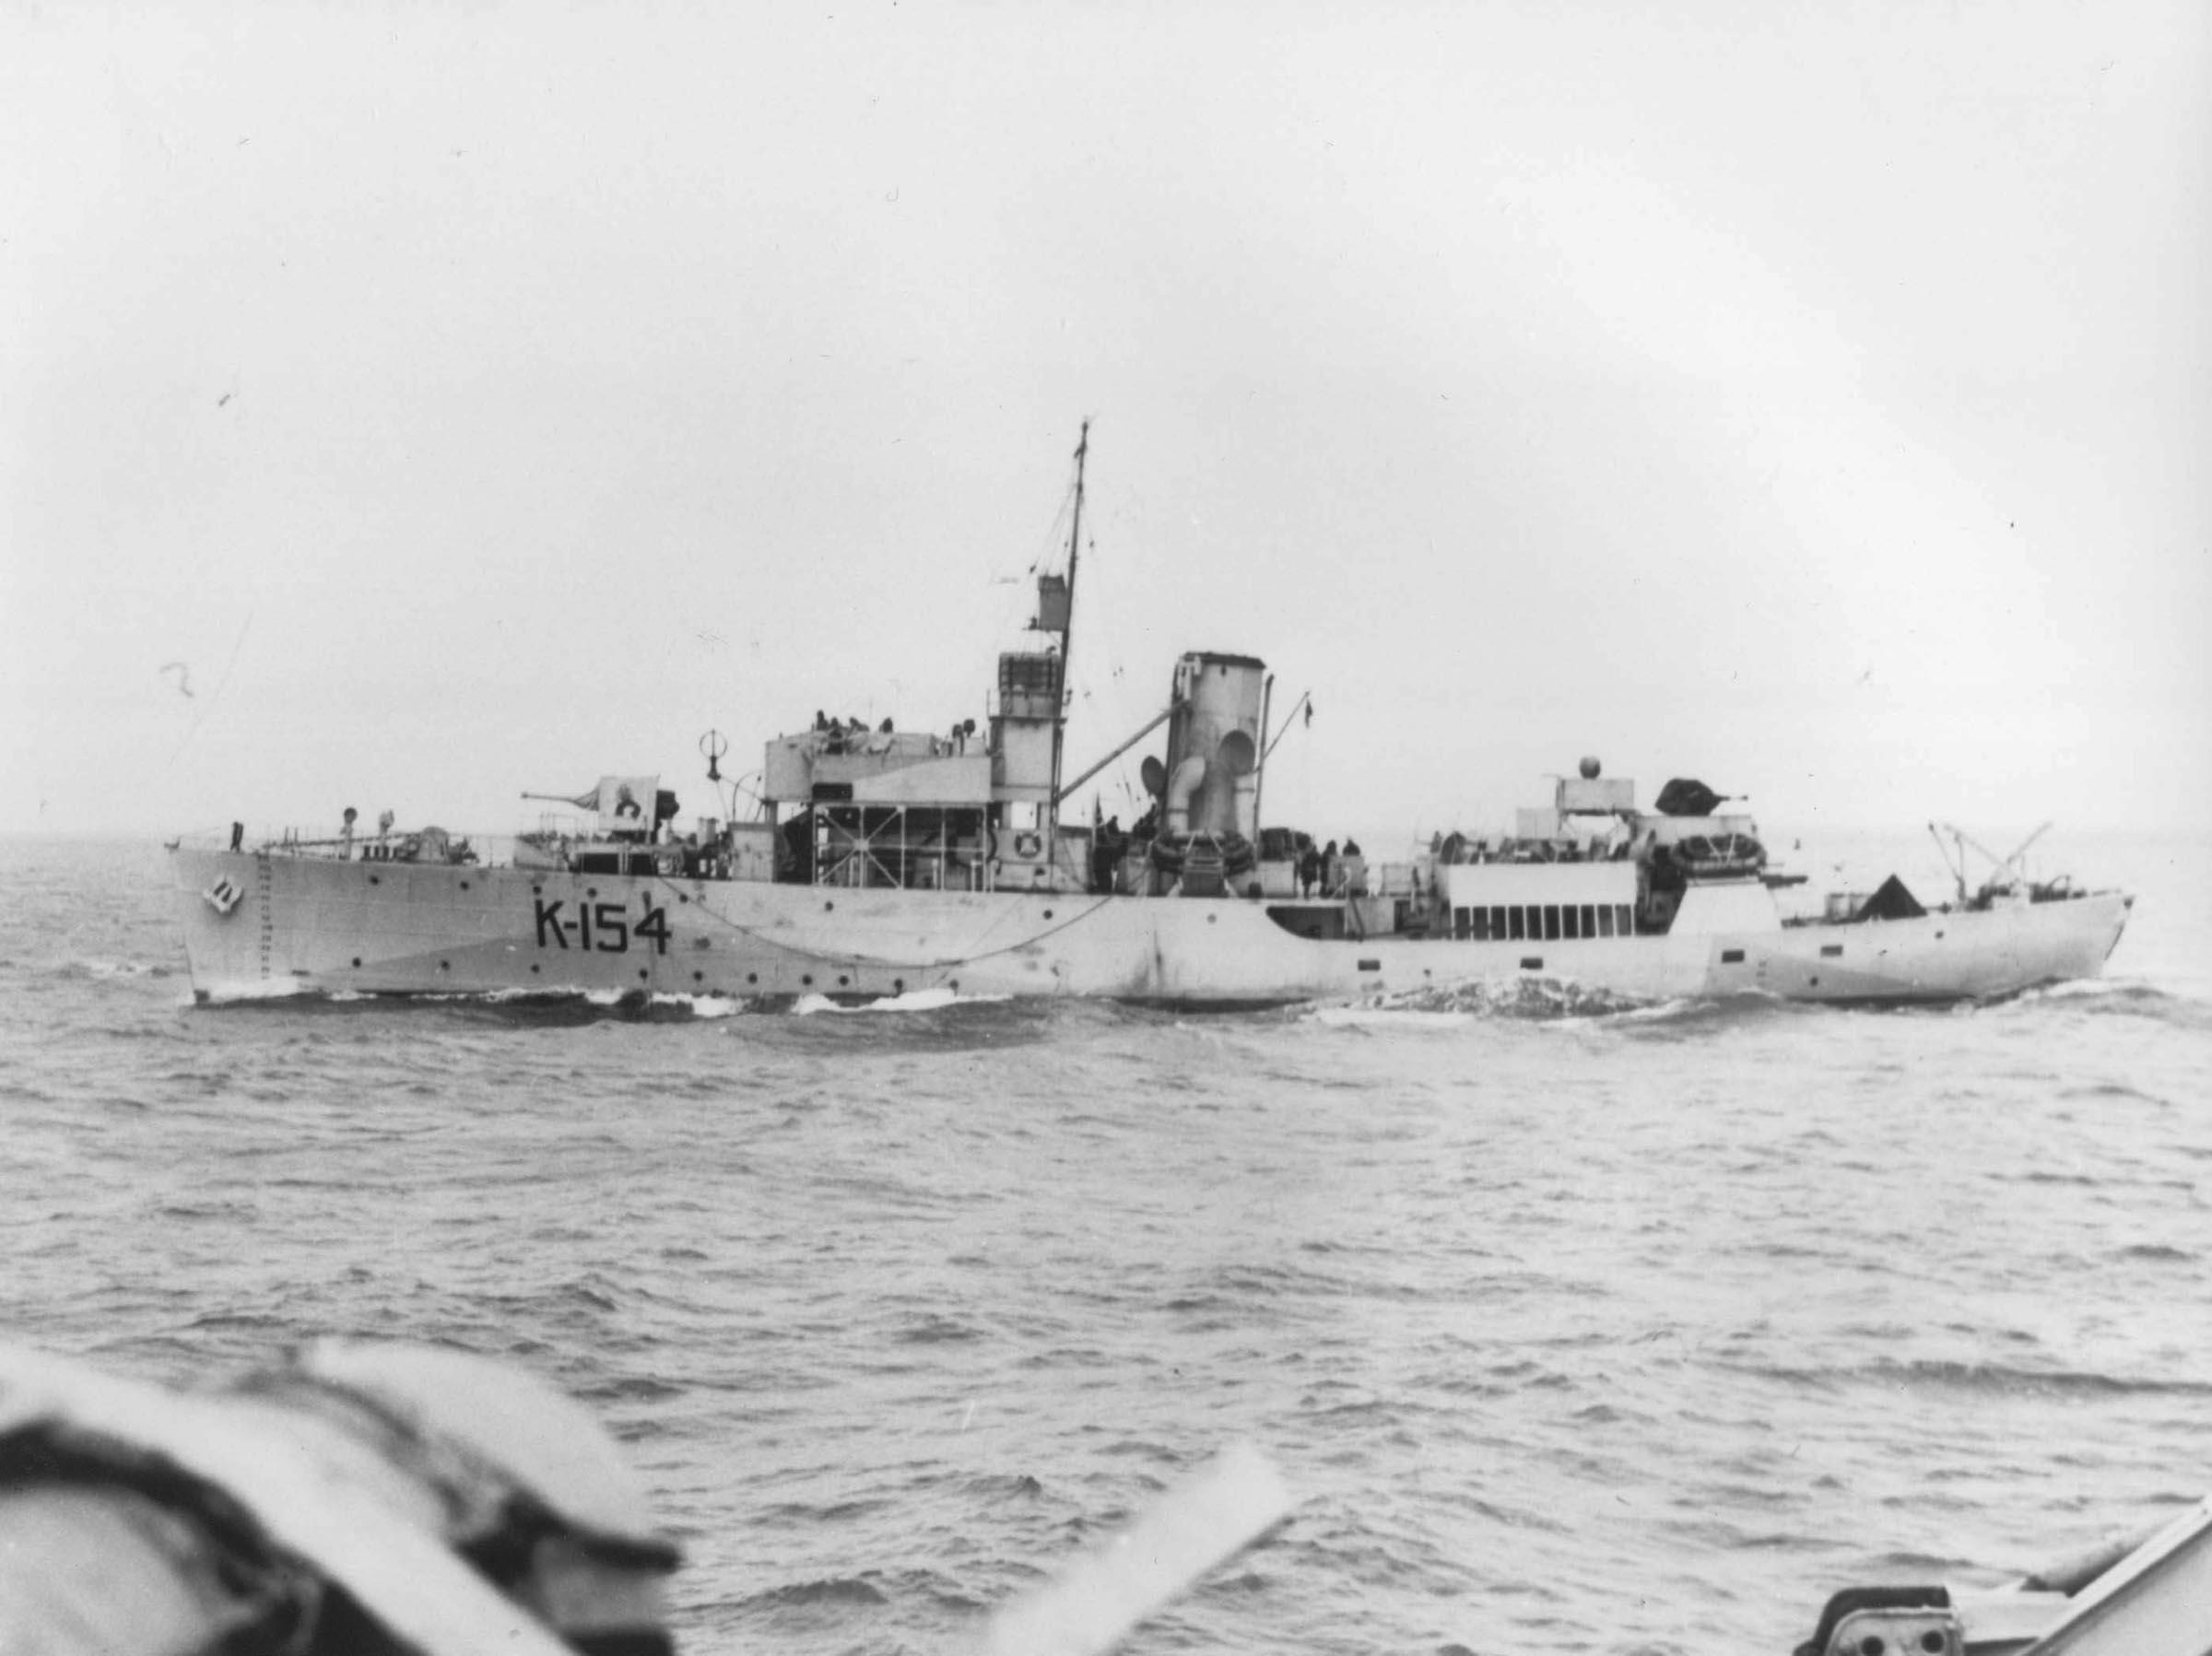 HMCS CAMROSE